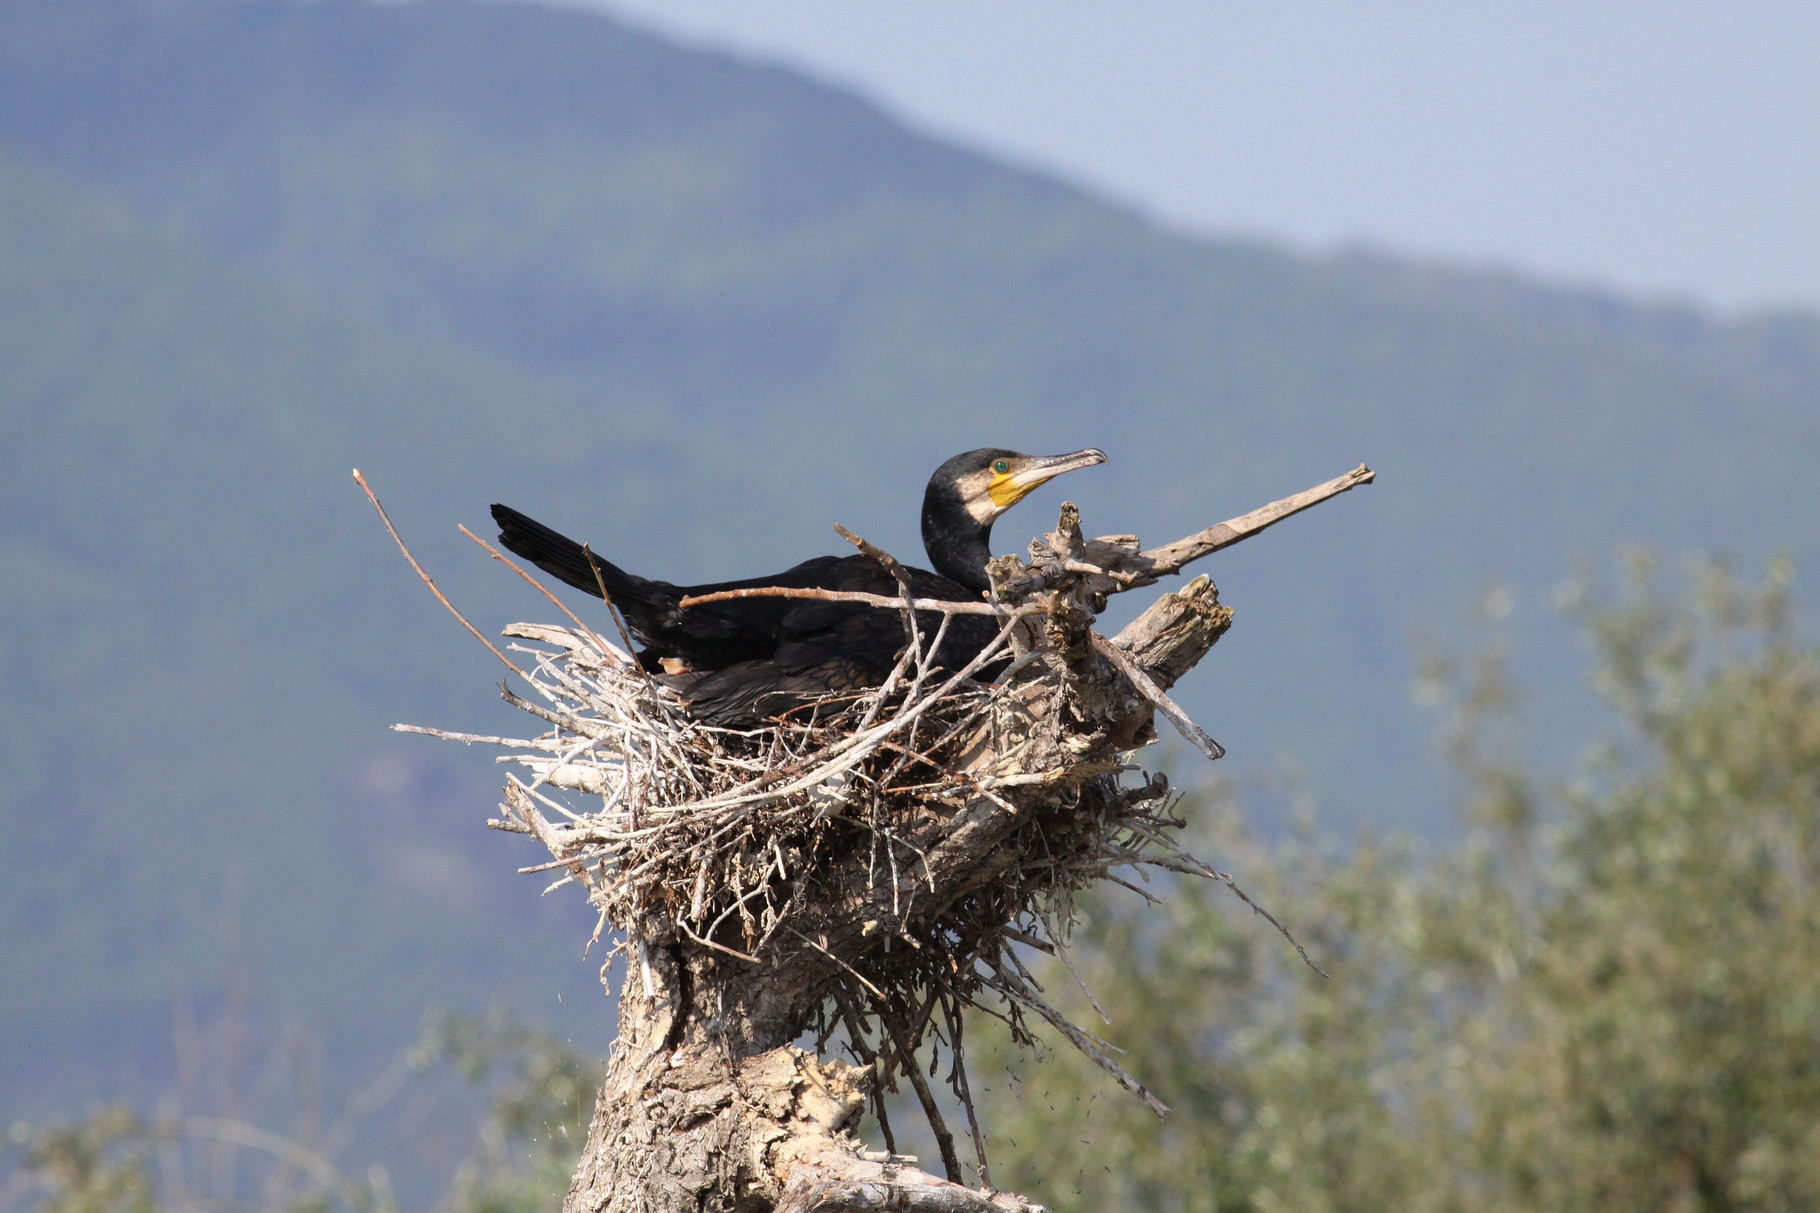 Kormoran am Nest: über 1000 Brutpaare kommen am Kerkini vor